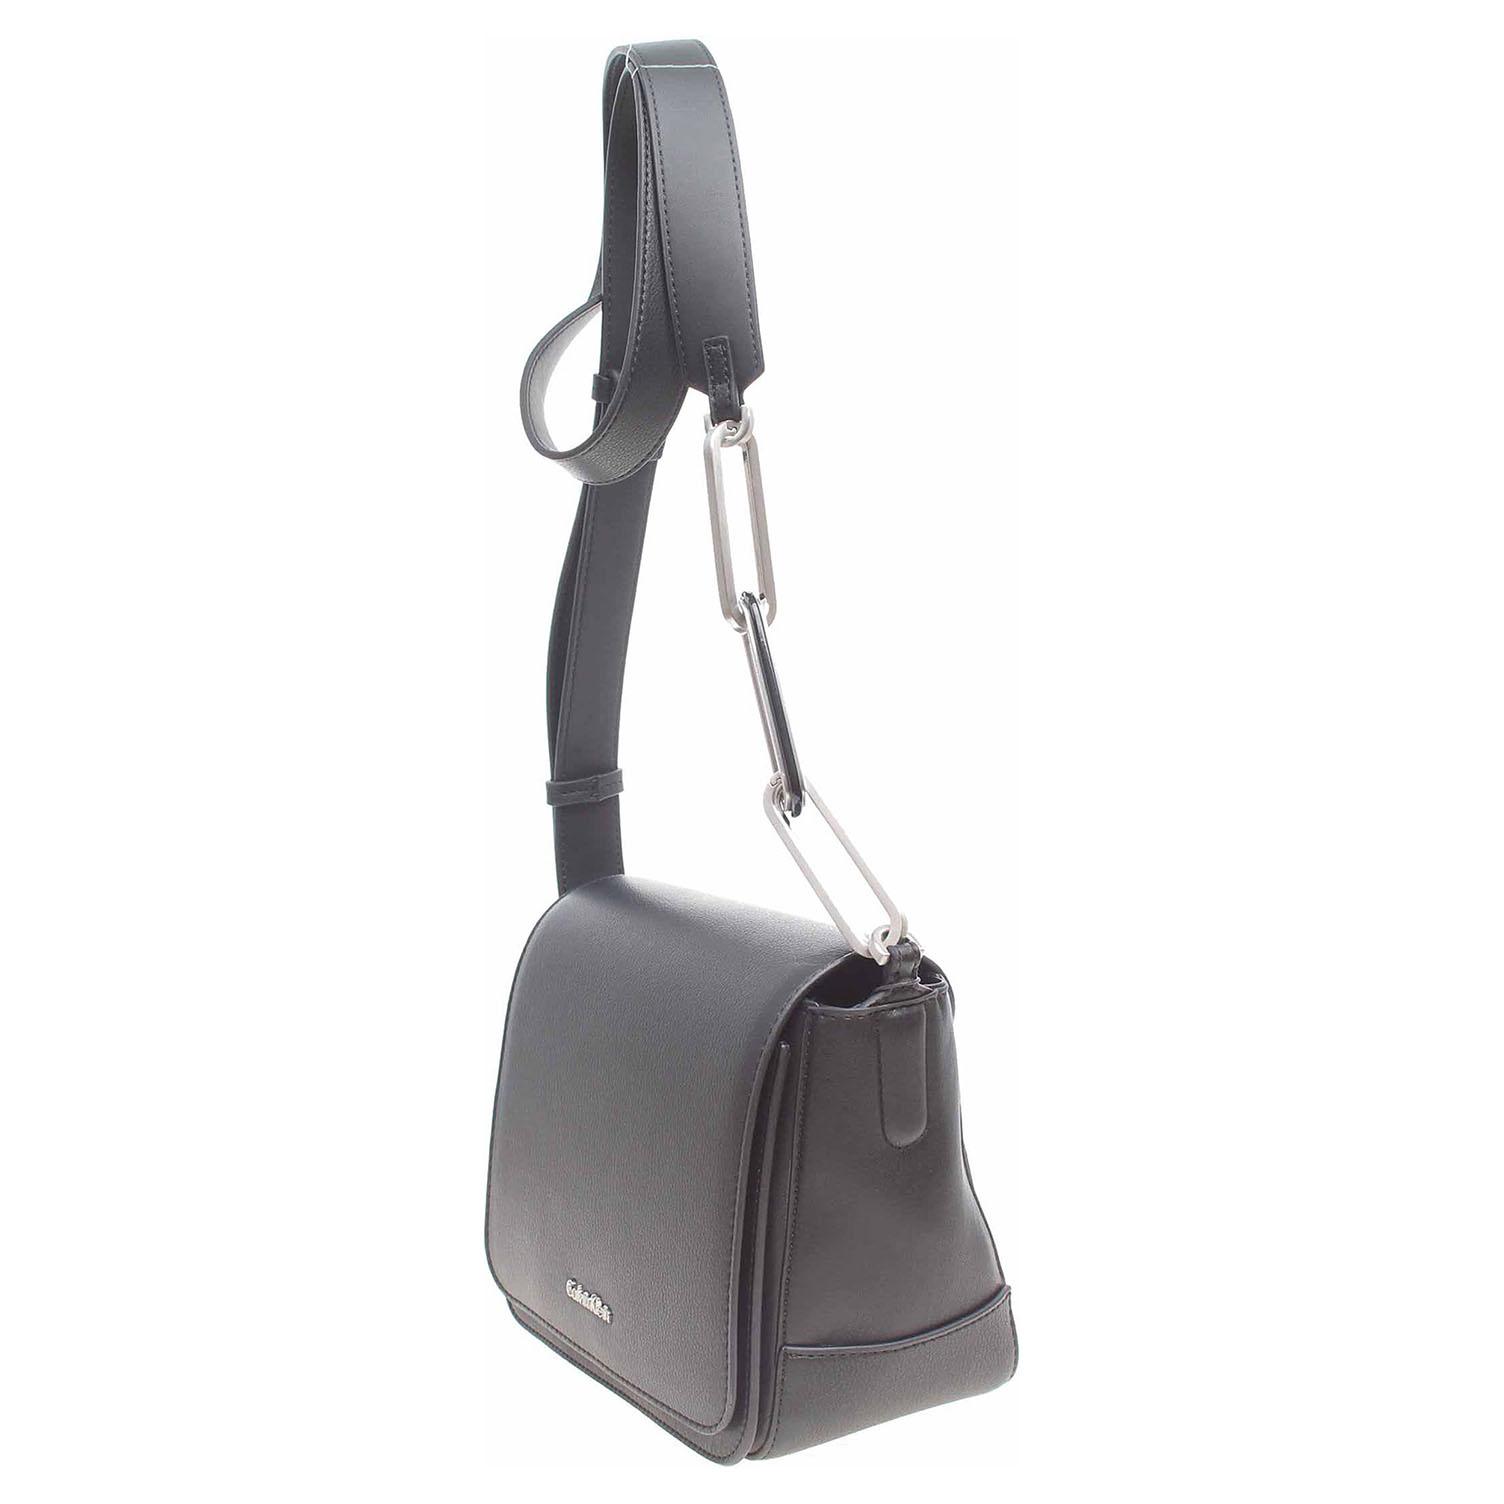 Ecco Calvin Klein dámská kabelka K60K602690001 černá 11891168